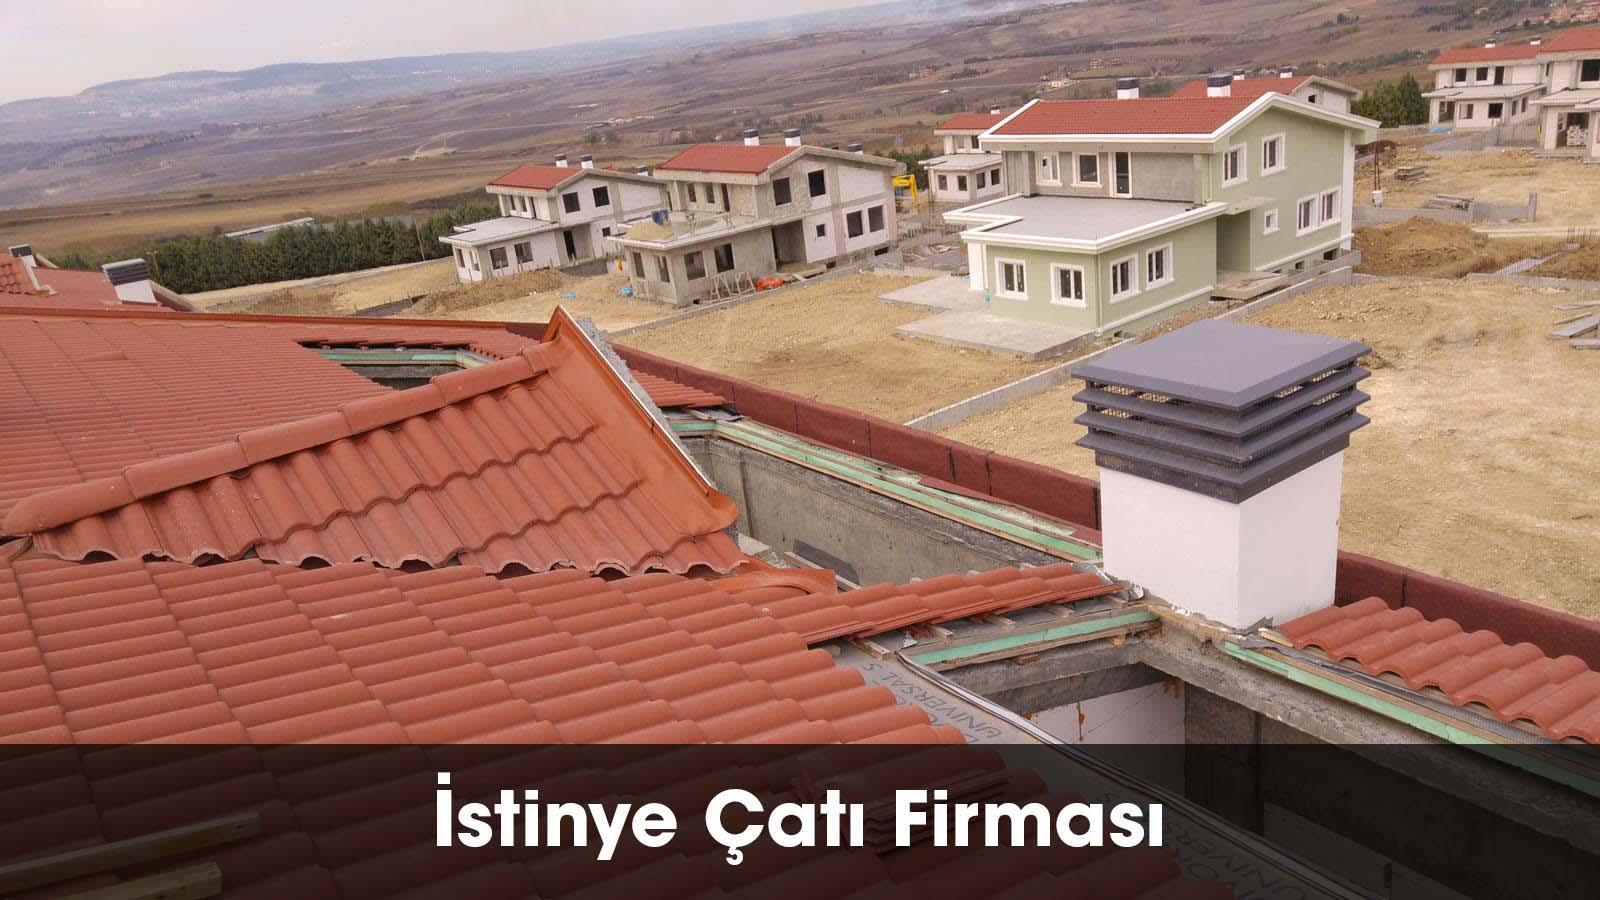 İstinye çatı firması